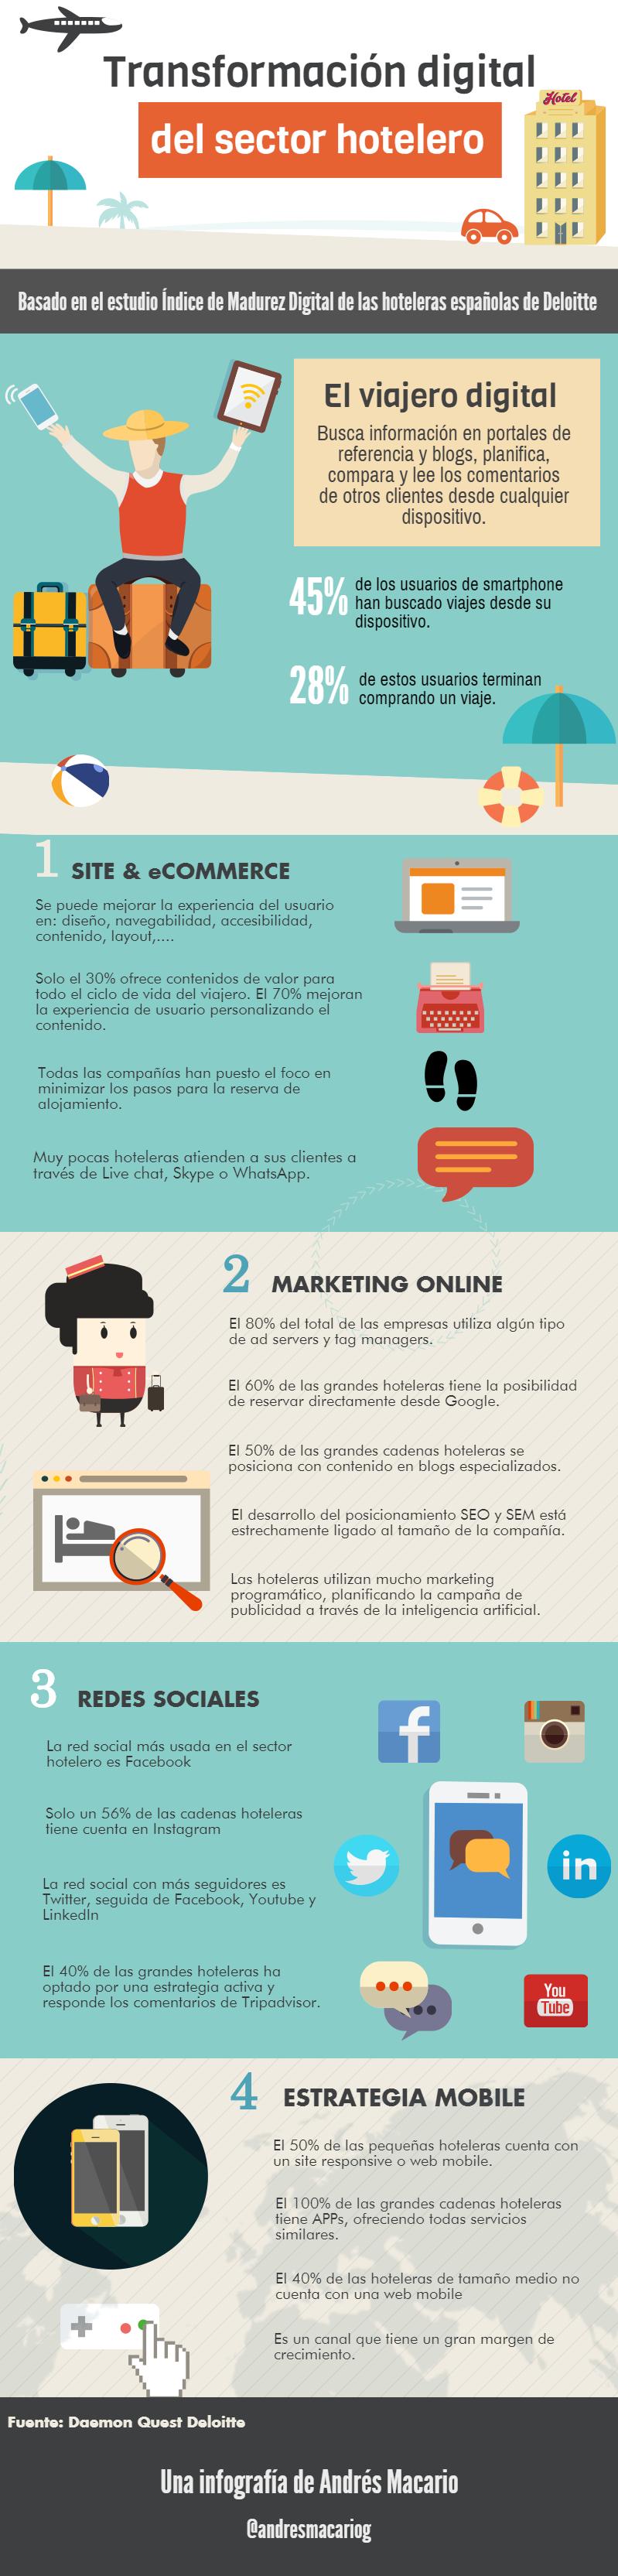 Transformacion digital del sector hotelero- Infografia Andres Macario